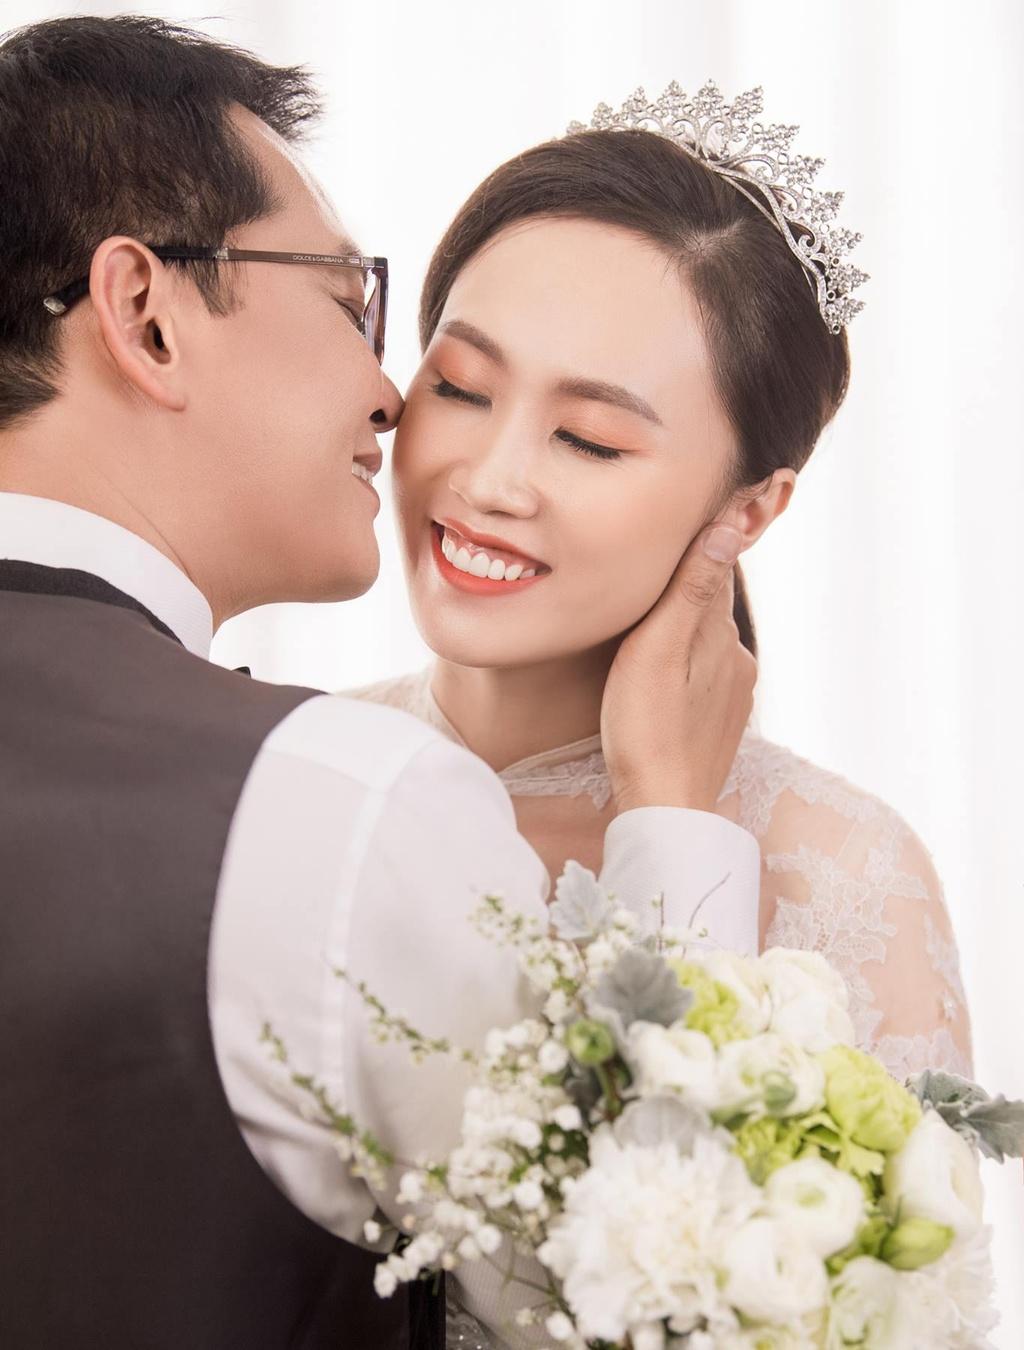 NSND Trung Hieu hanh phuc ben co dau kem 19 tuoi trong bo anh cuoi hinh anh 1